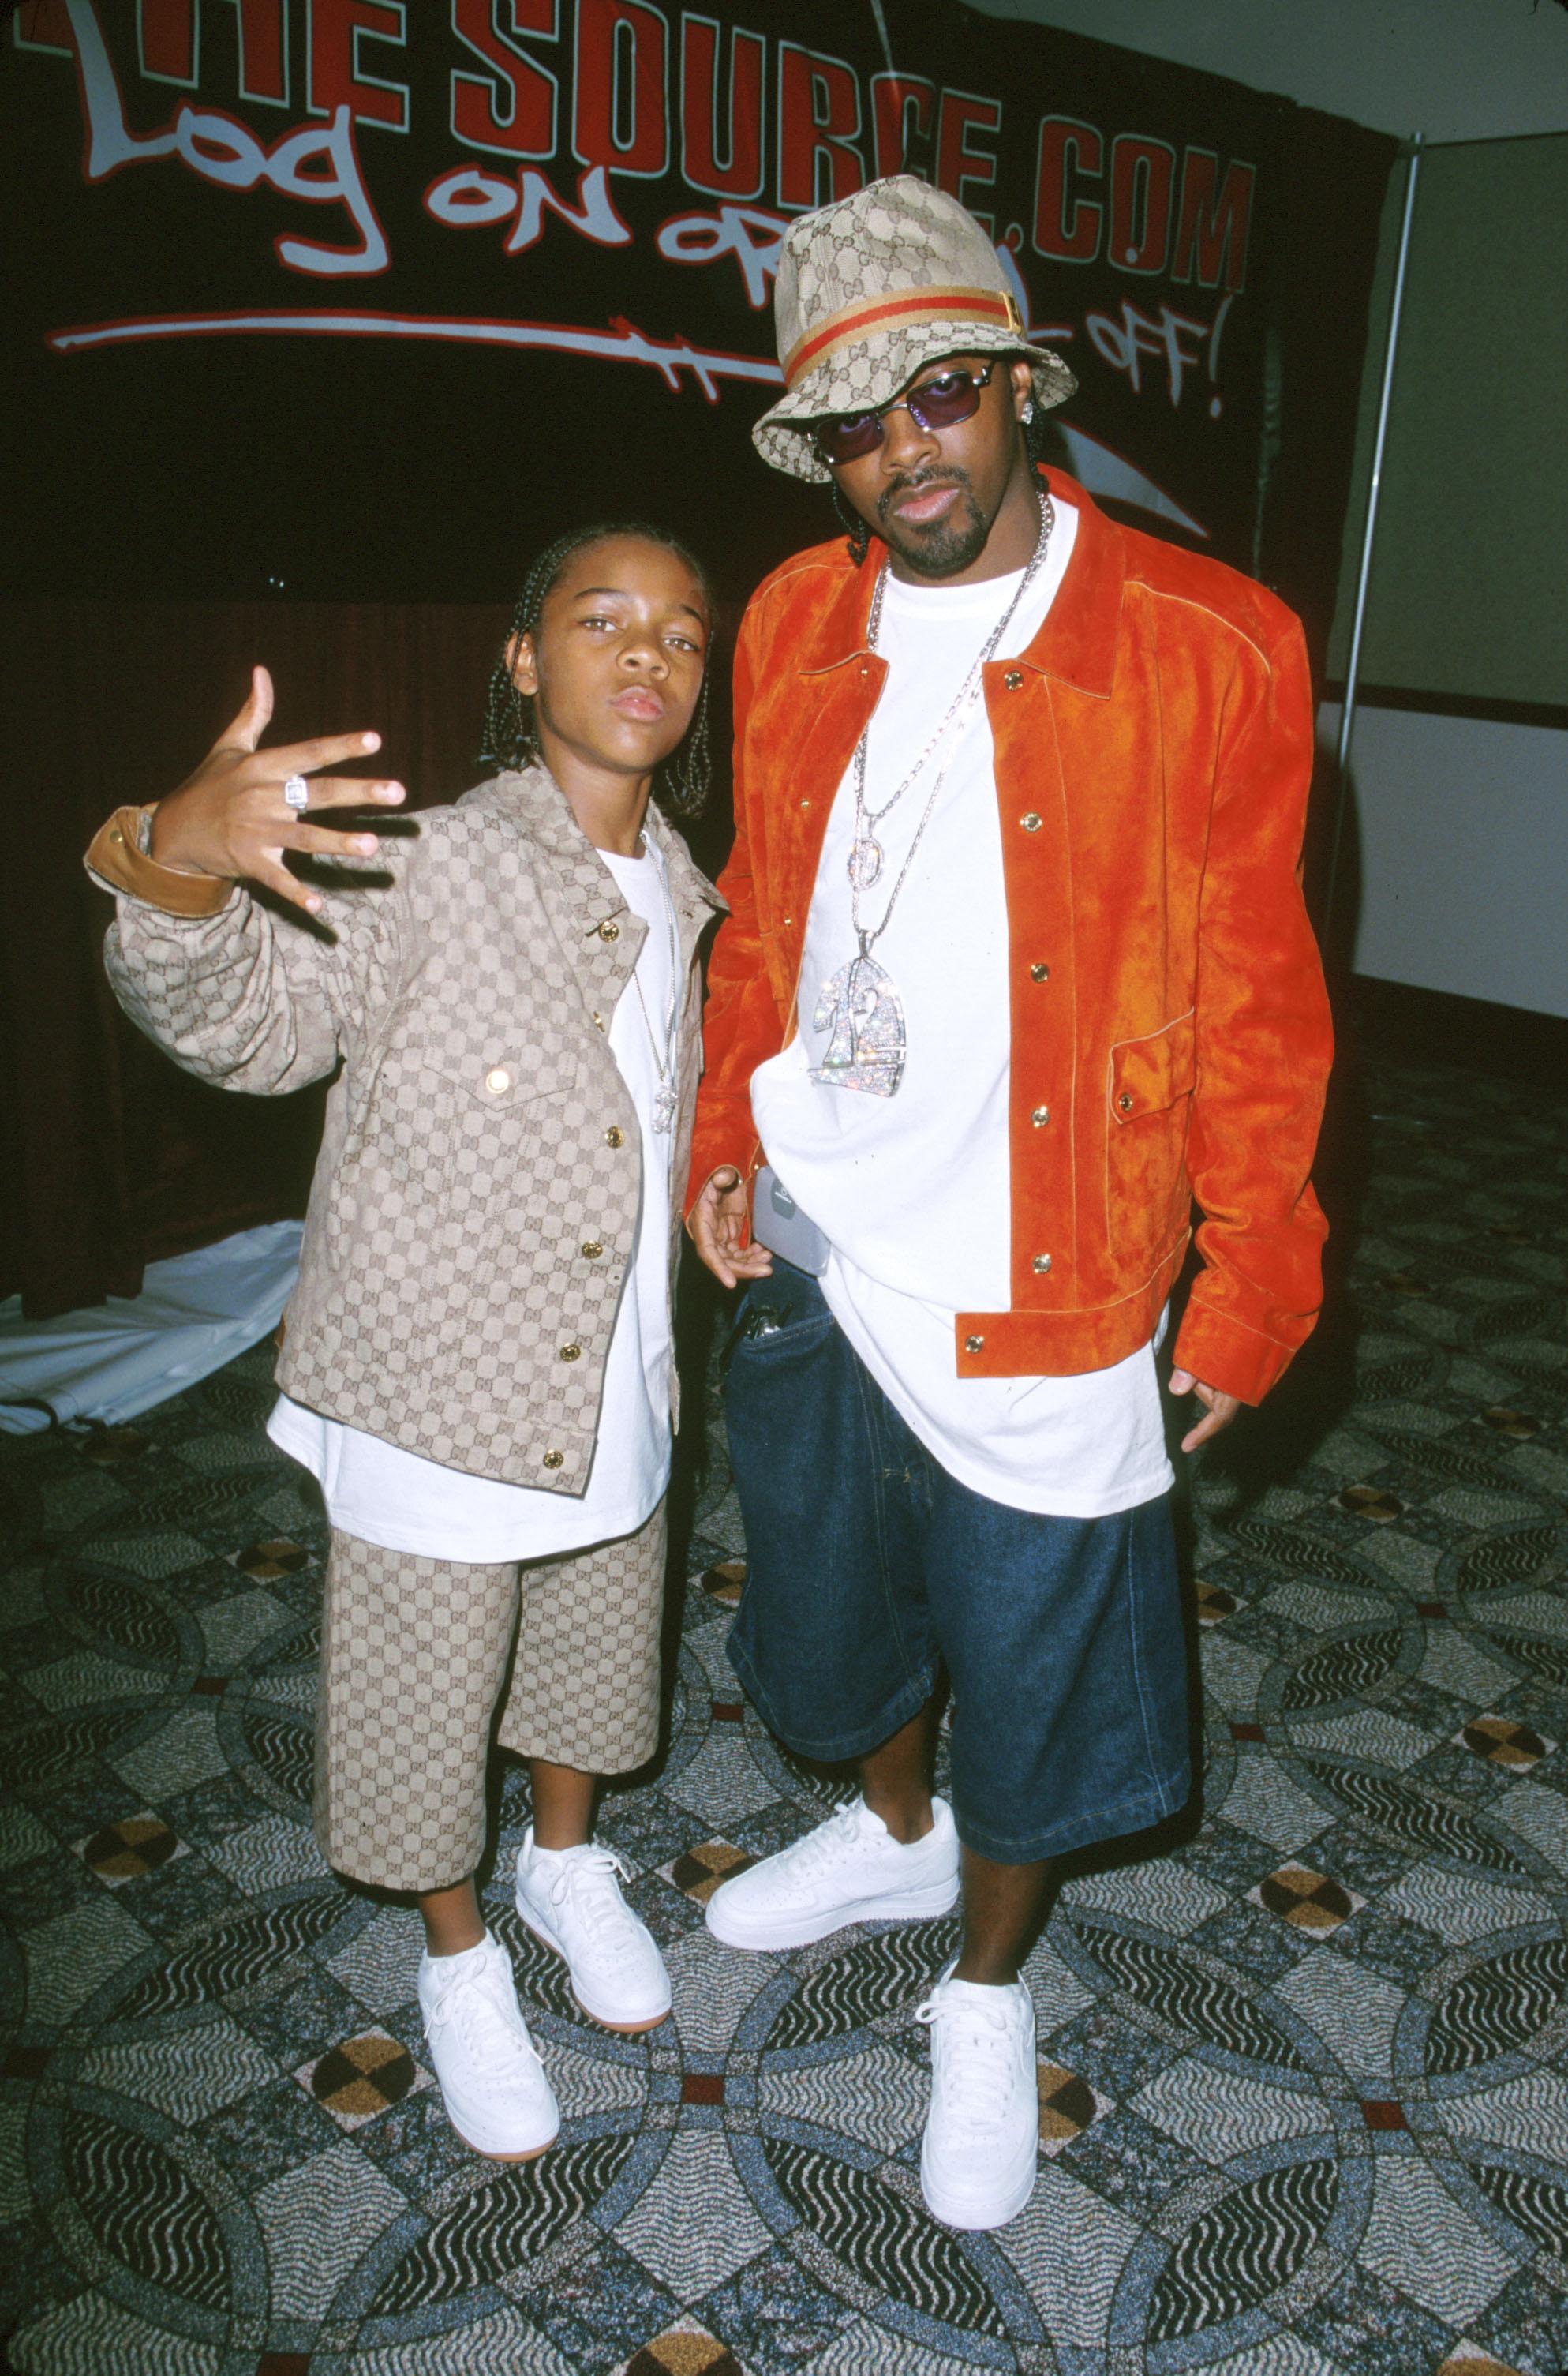 The 2000 Source Hip-Hop Music Awards